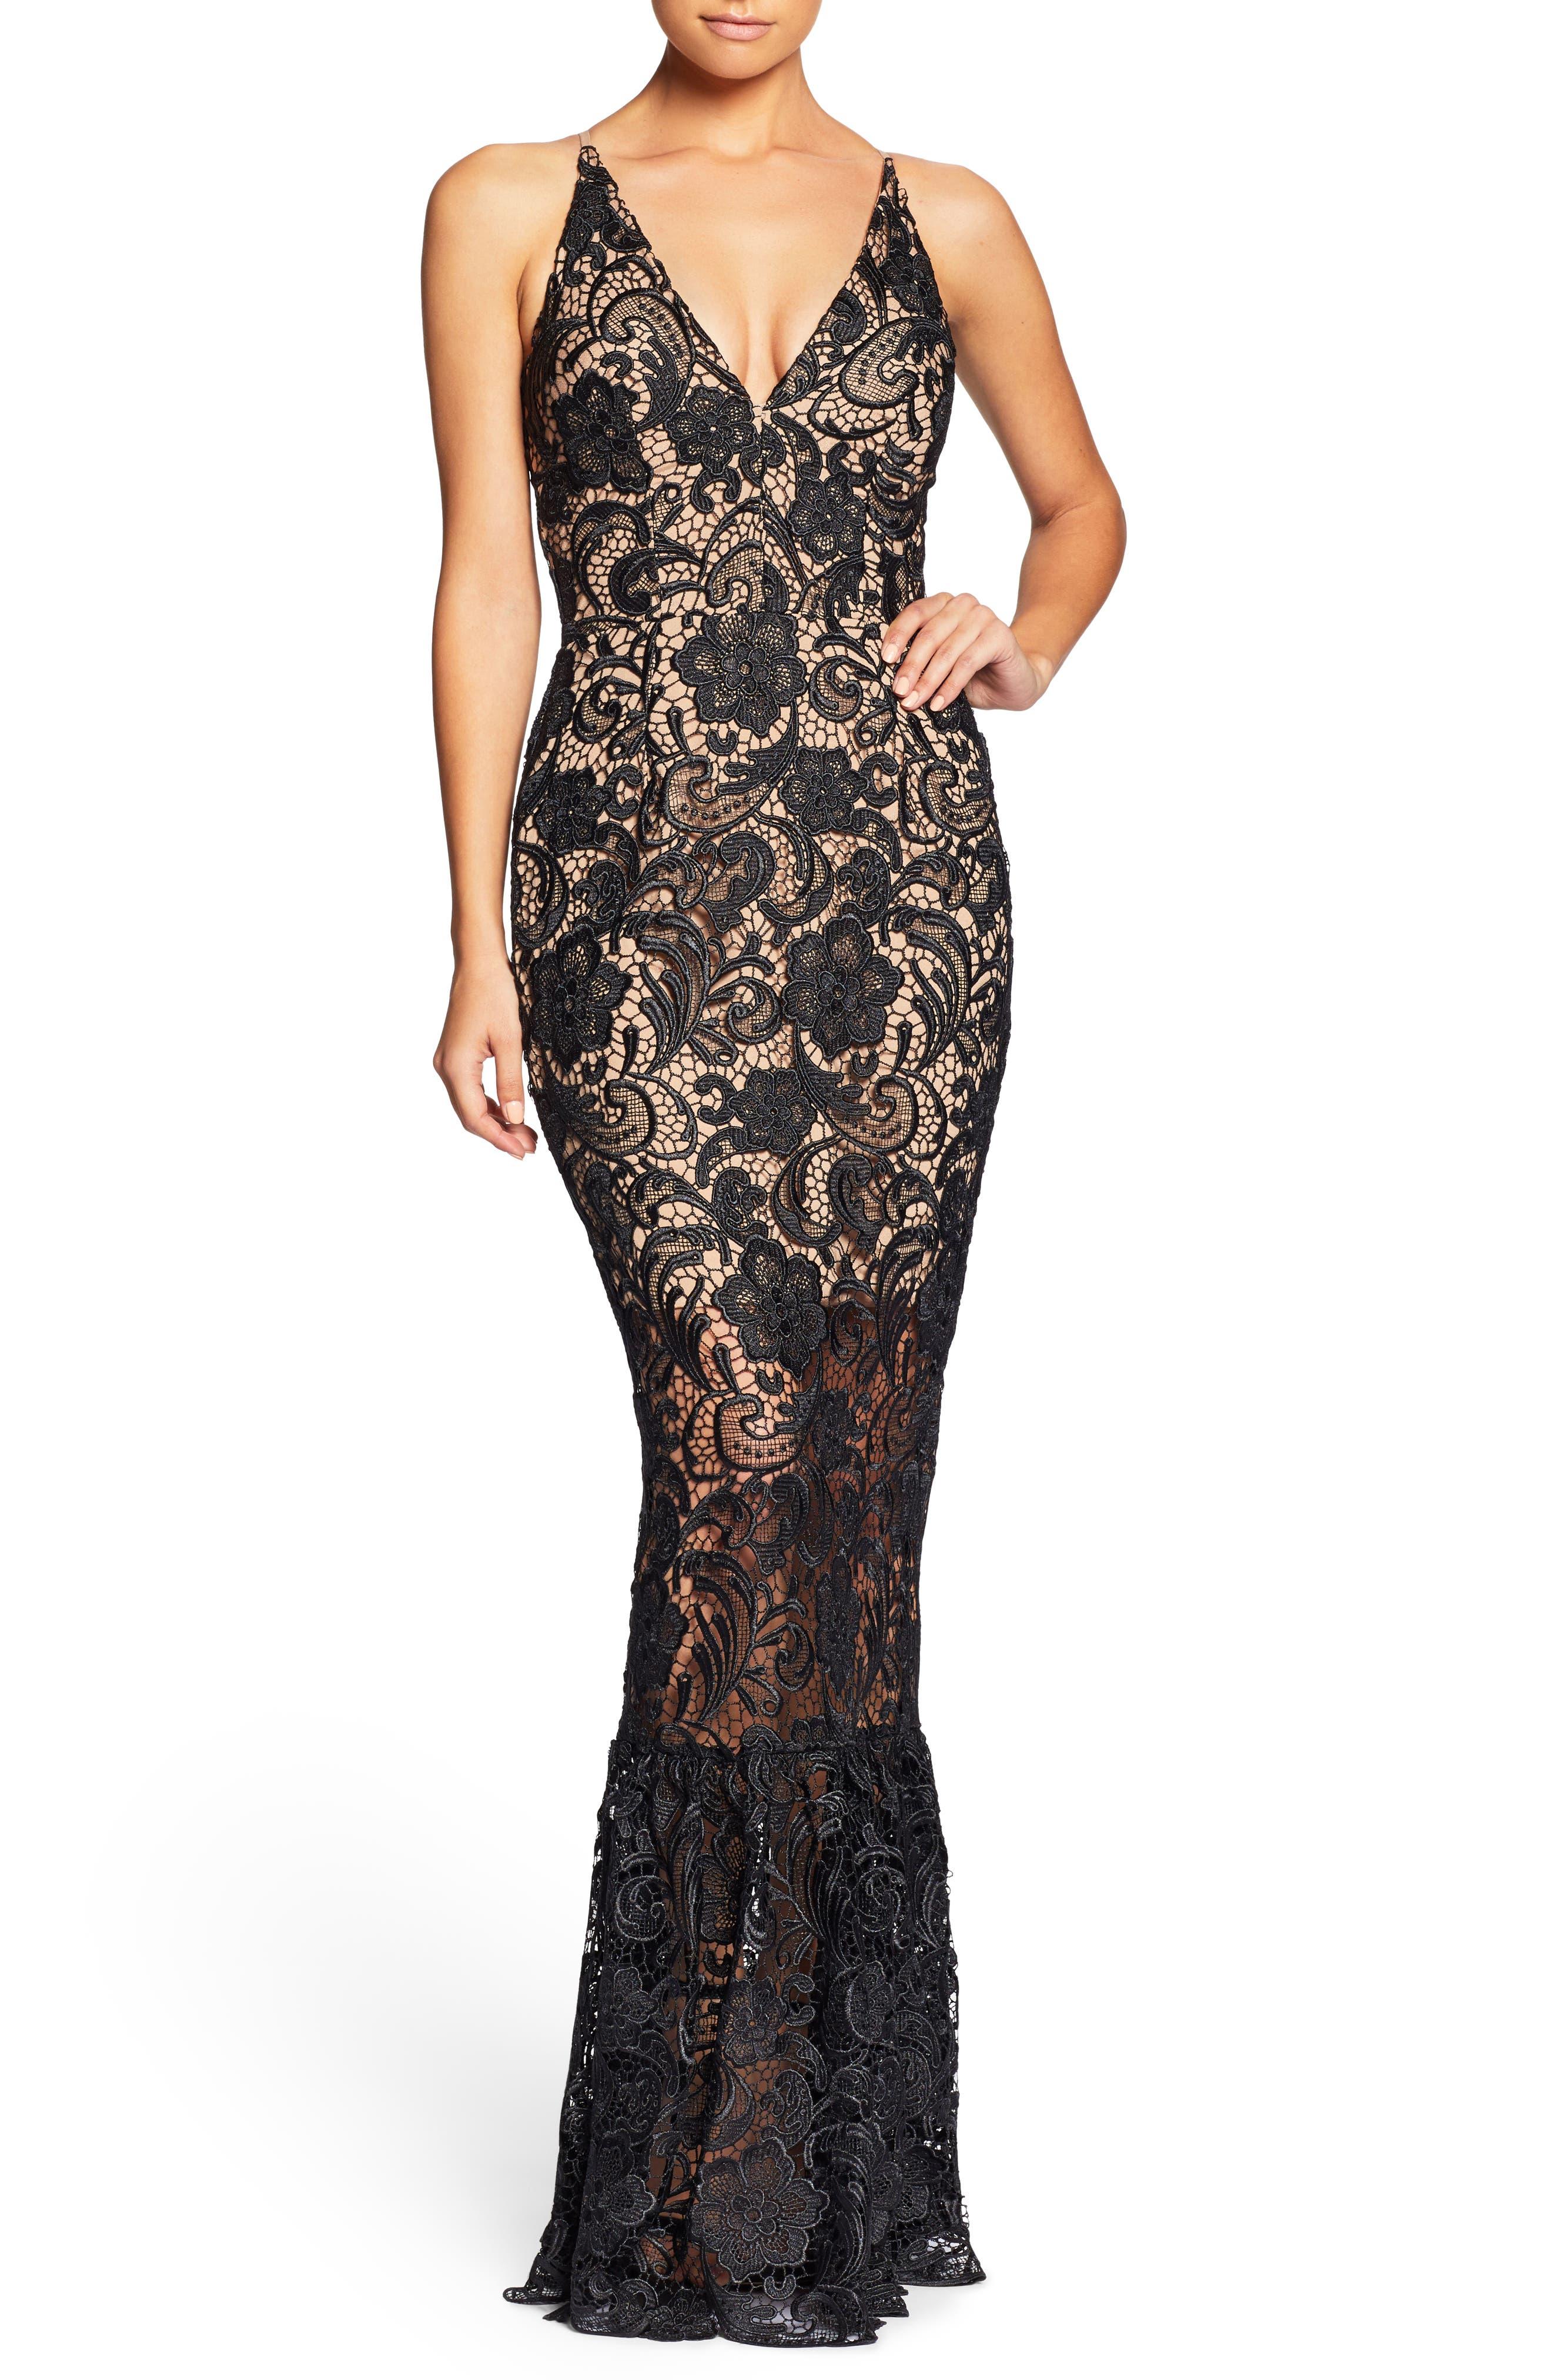 Sophia Crochet Lace Mermaid Gown,                             Alternate thumbnail 4, color,                             014